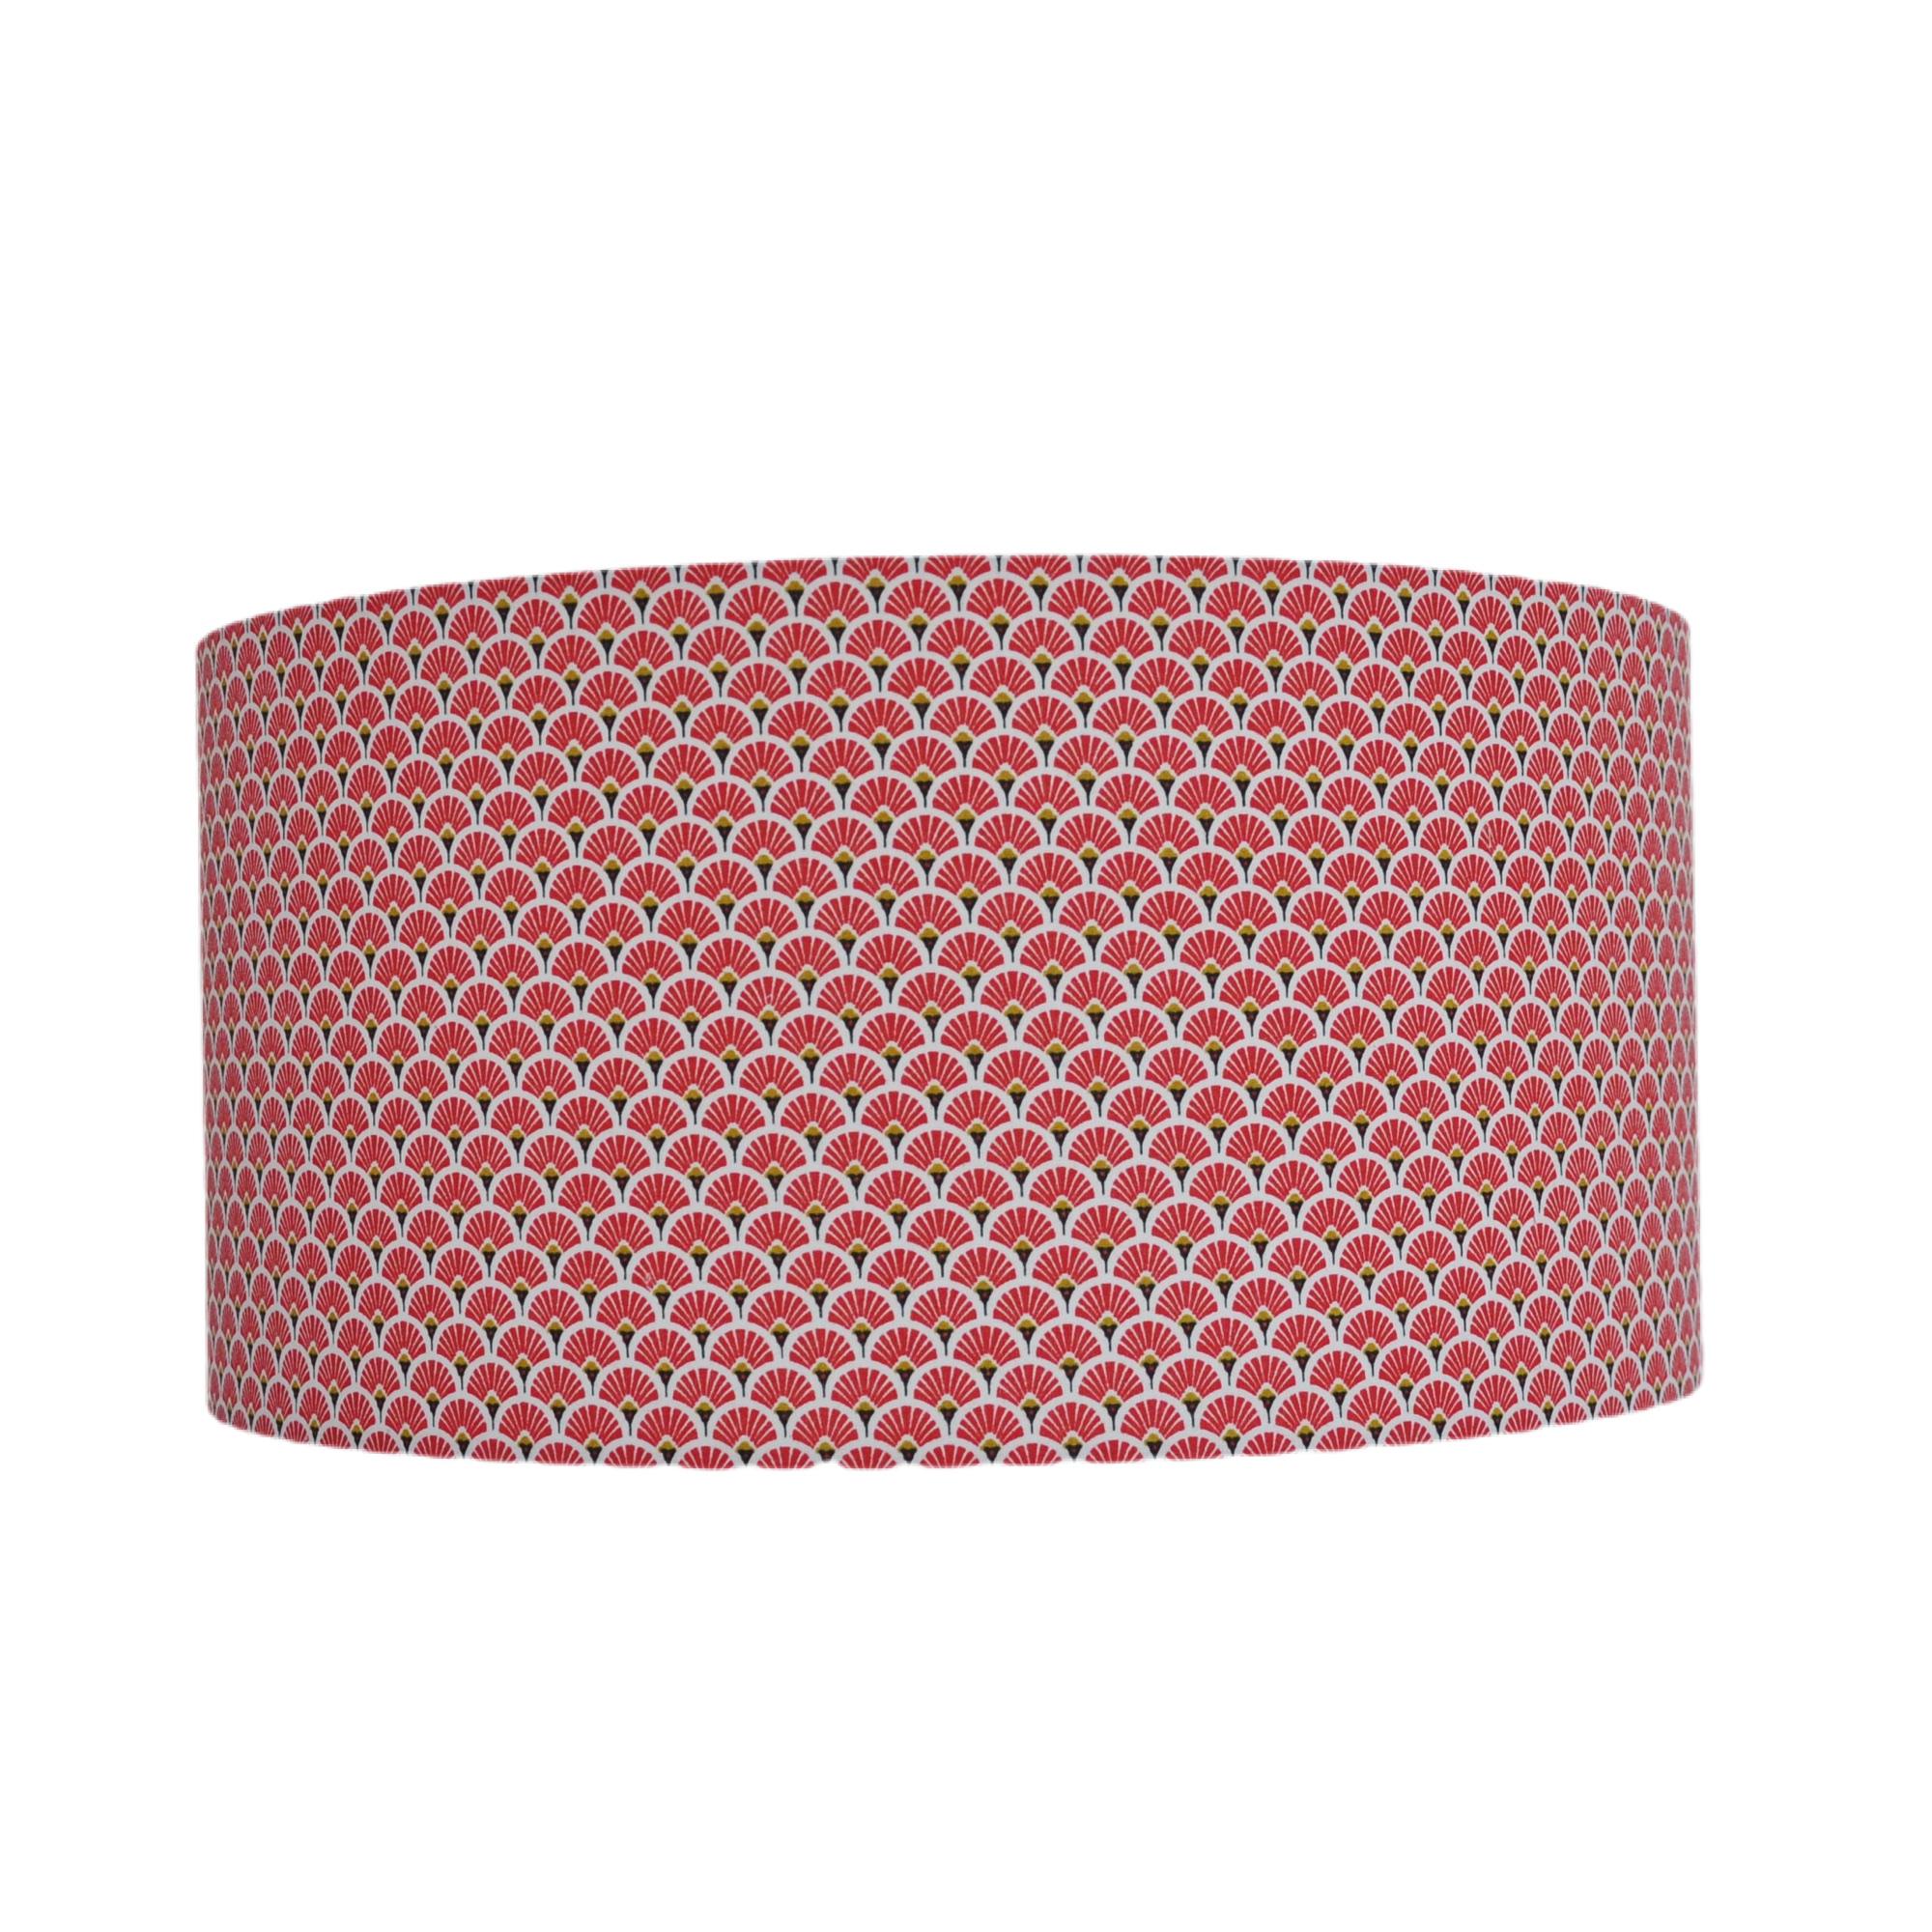 Suspension eventail rouge et or diamètre 15 cm